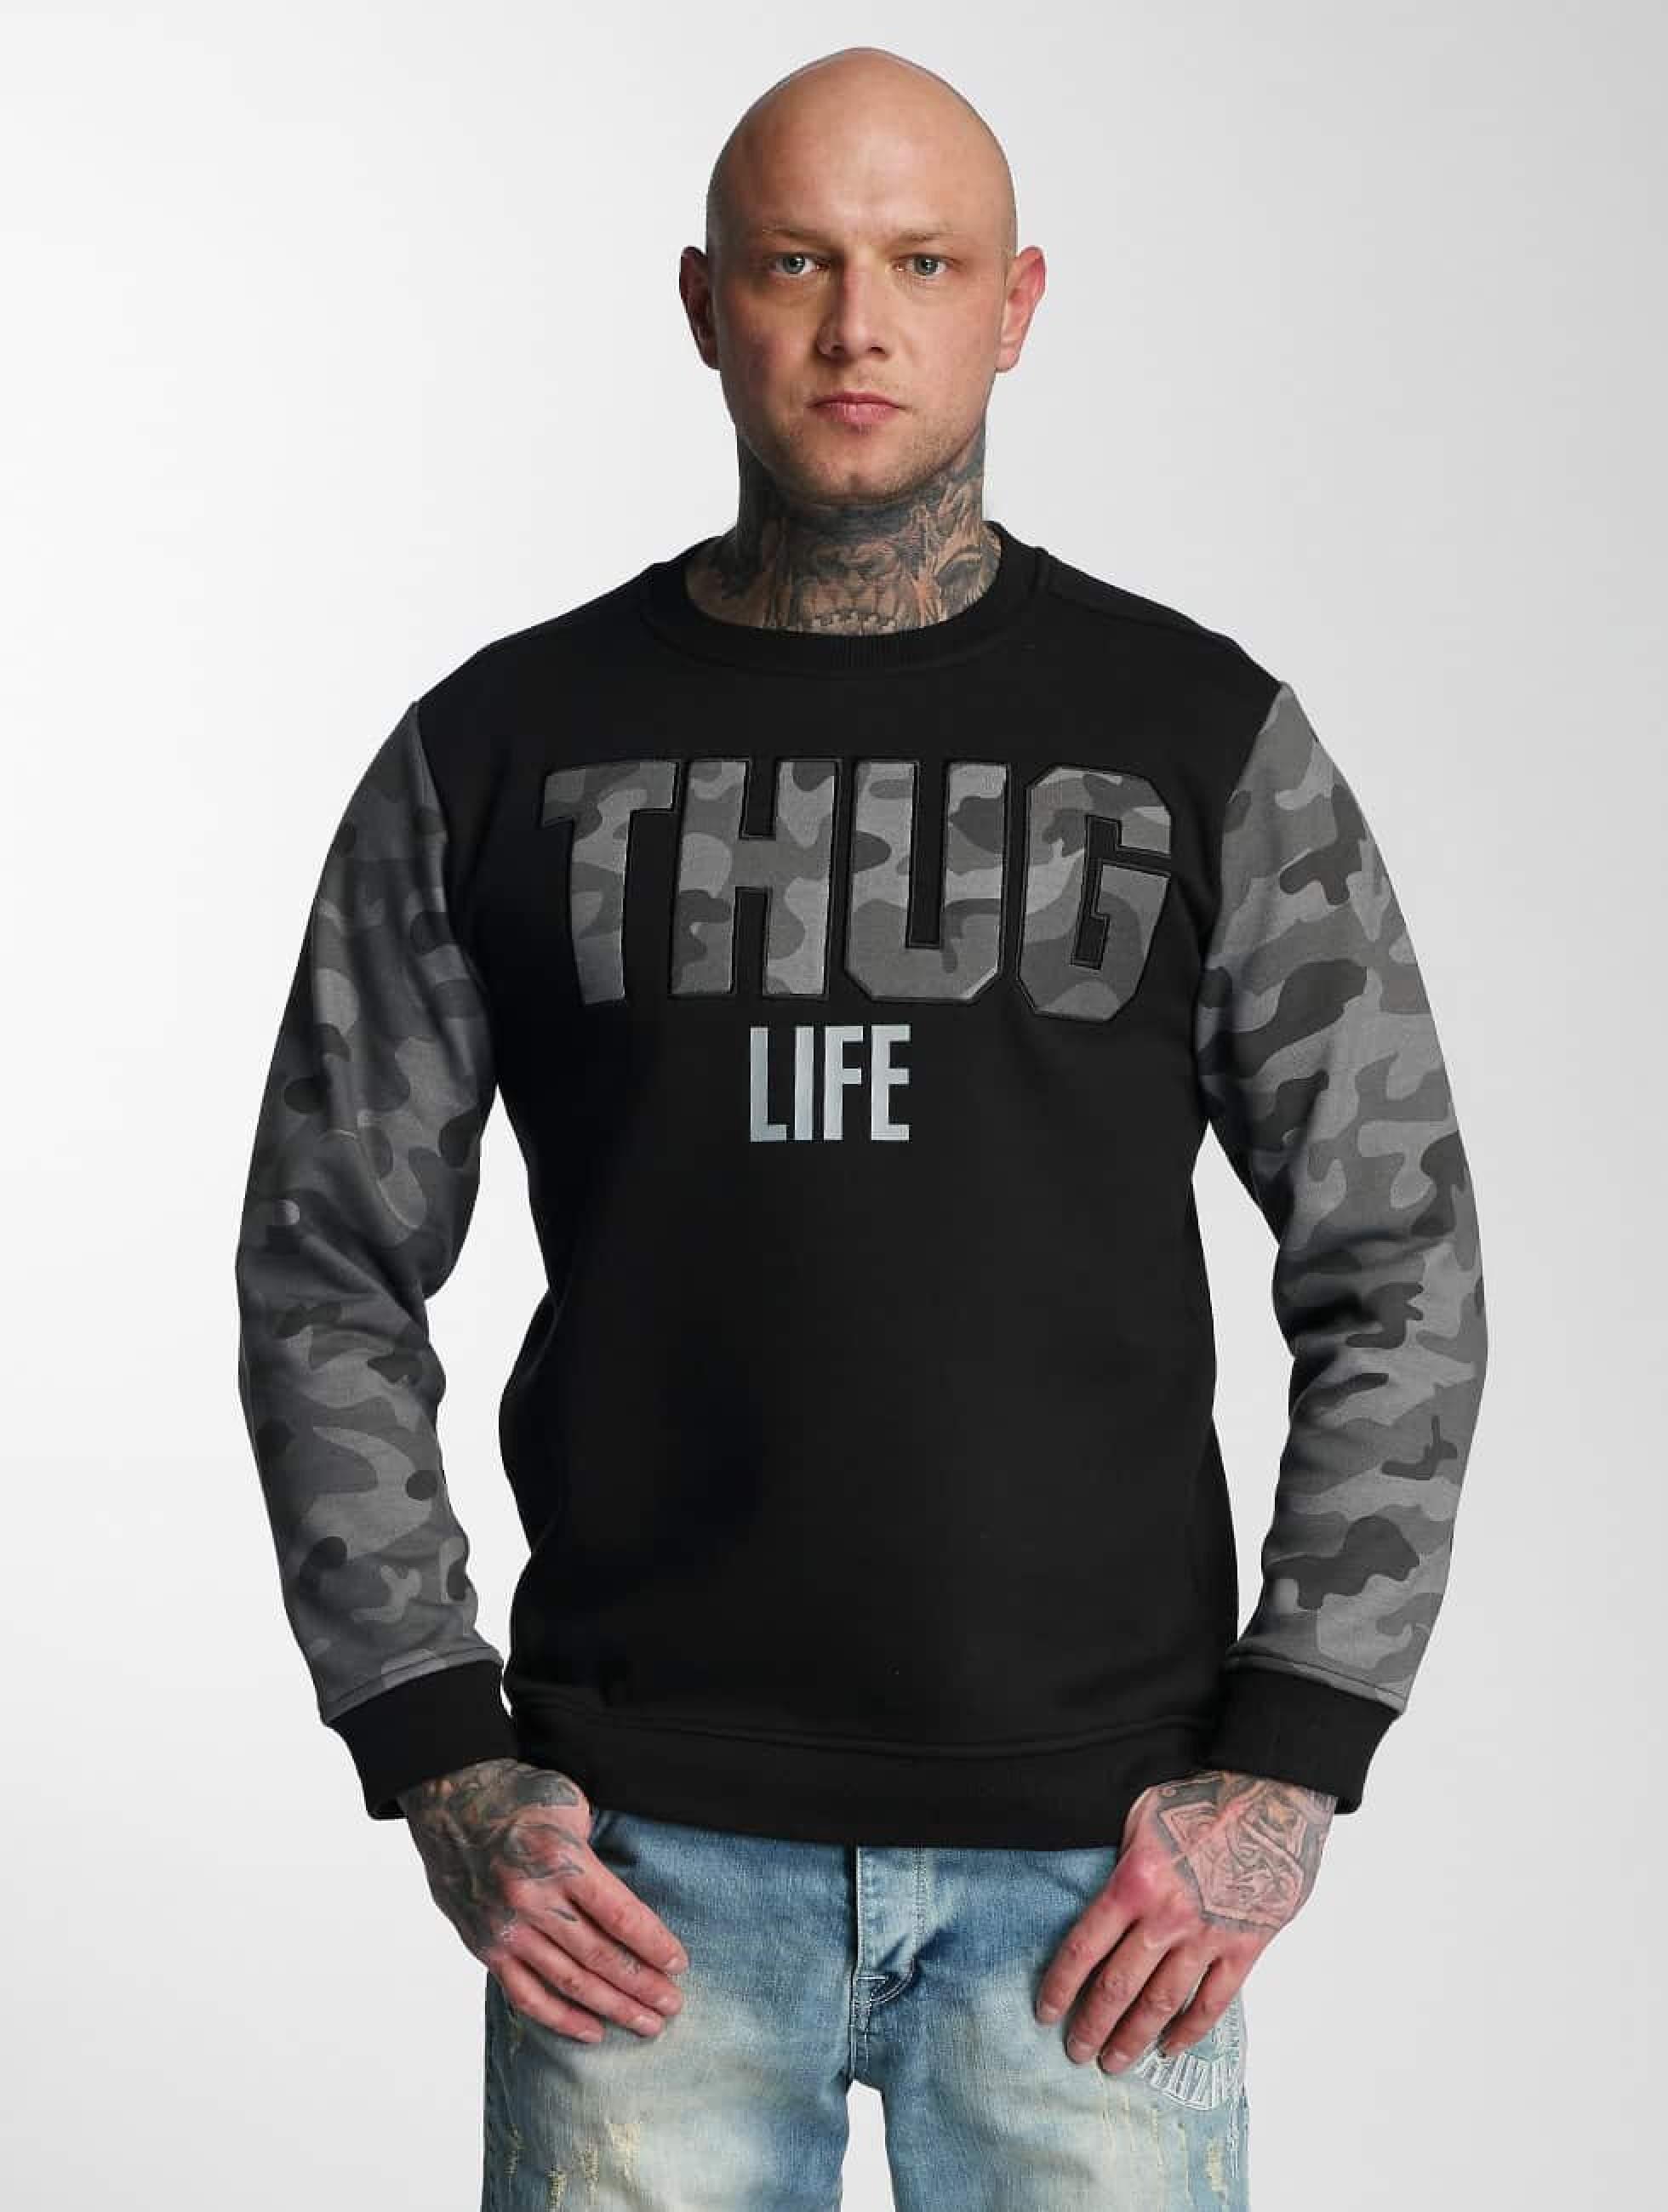 Thug Life / Jumper Zombi in grey XL